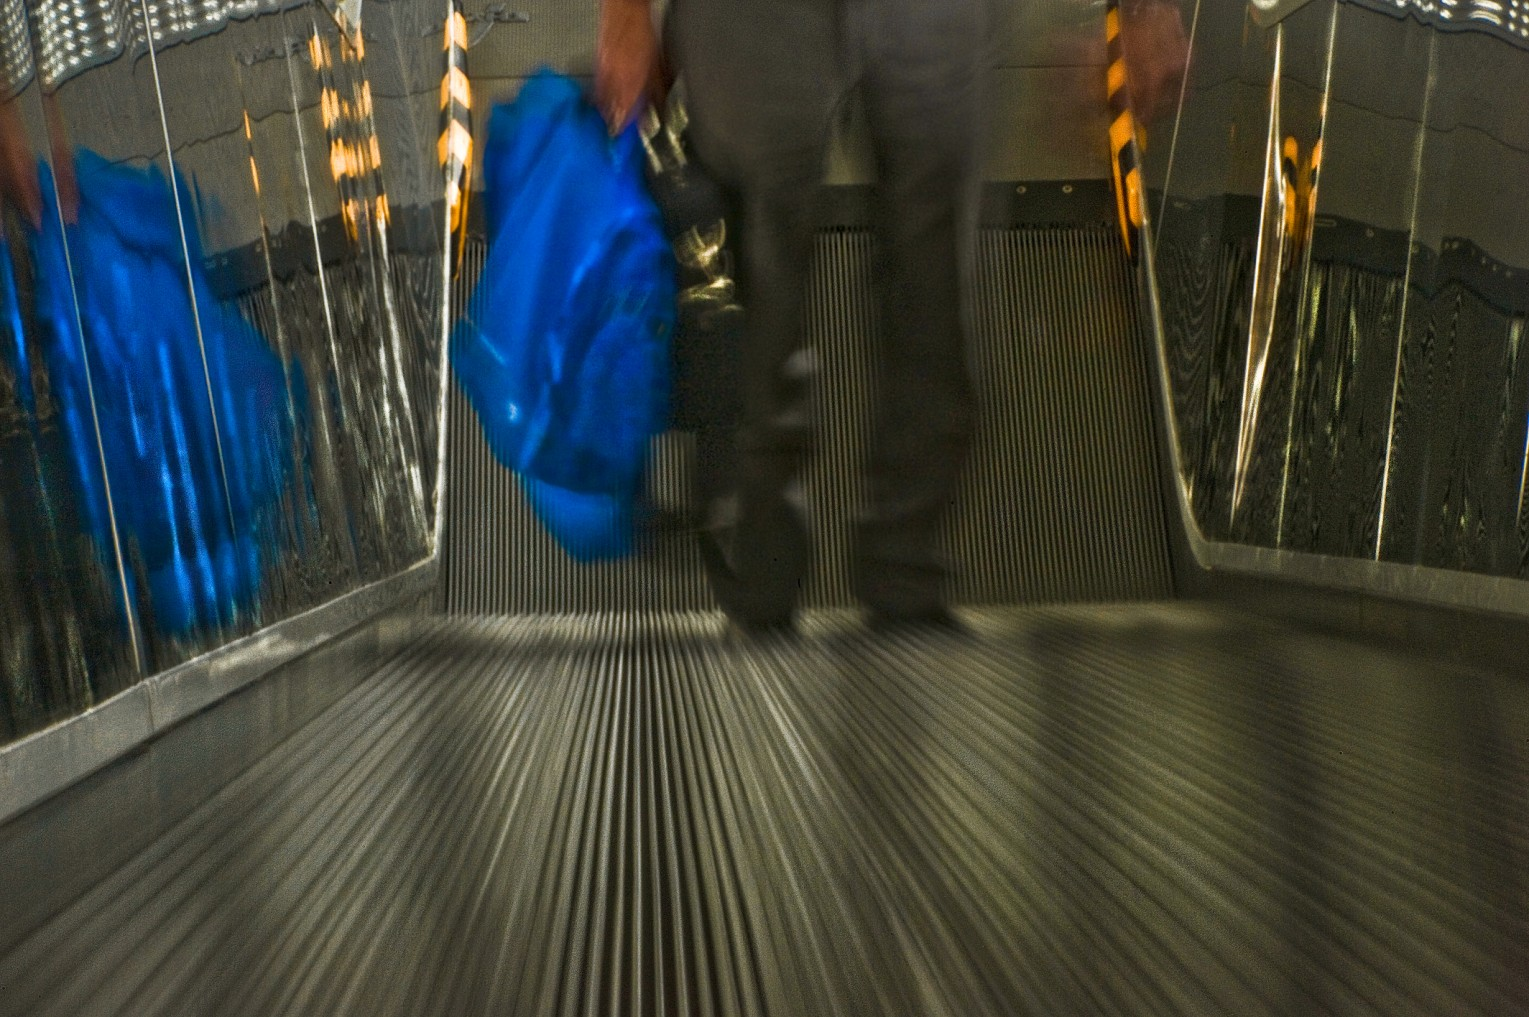 scala mobile, Fraport I